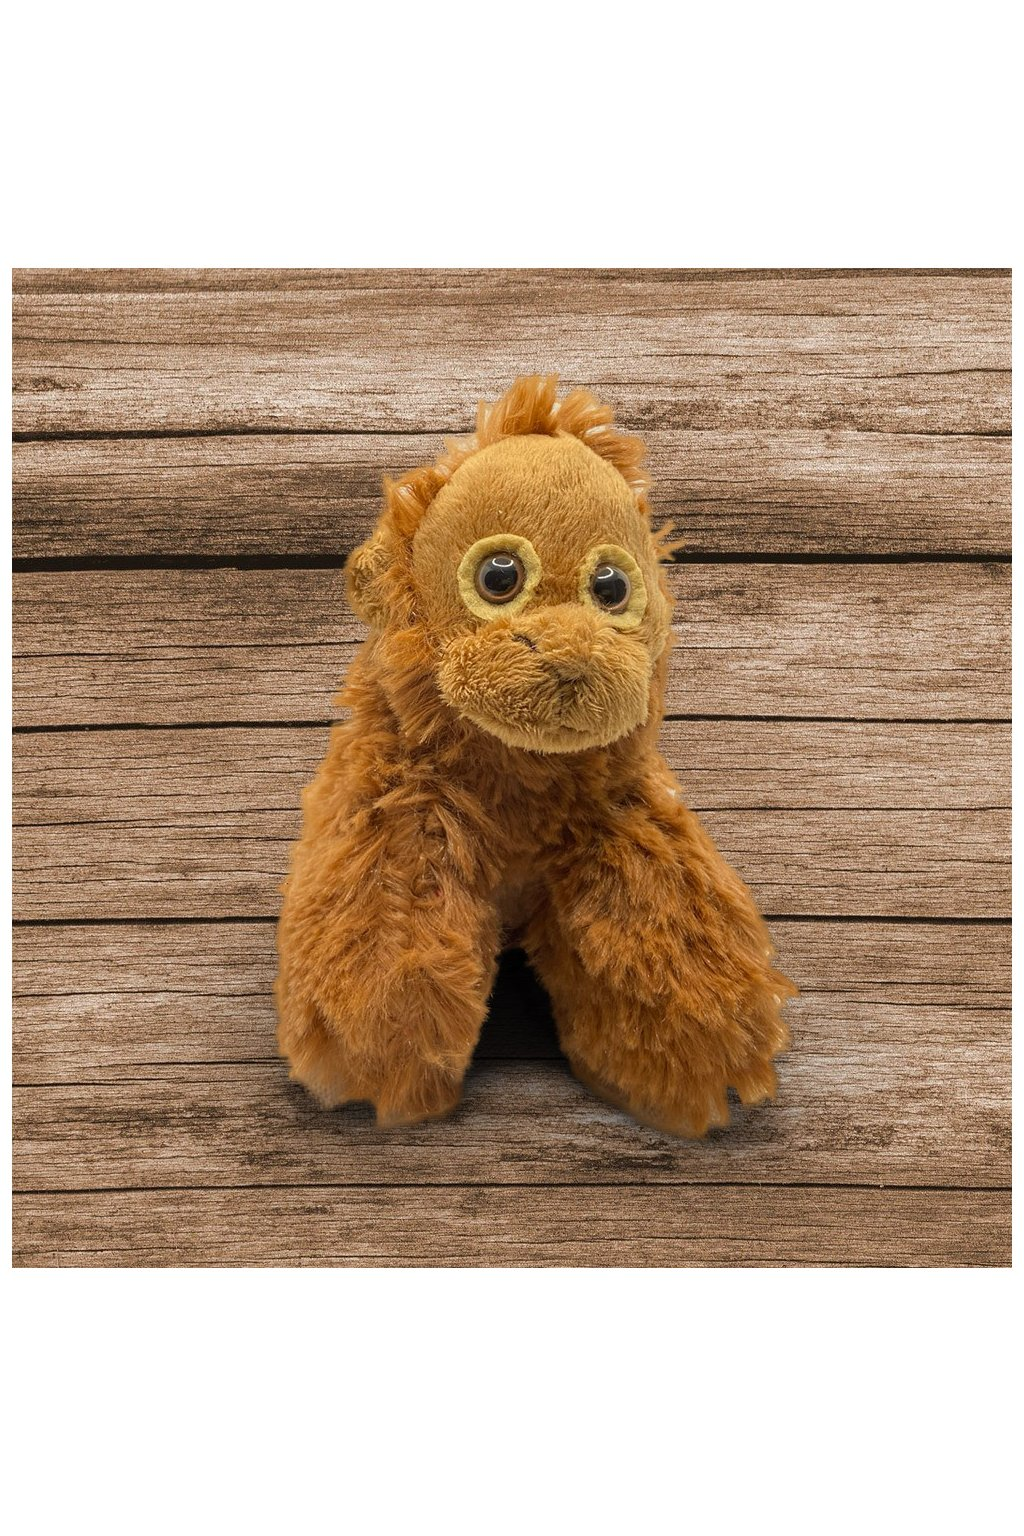 plysaci shoptet eshop orangutan